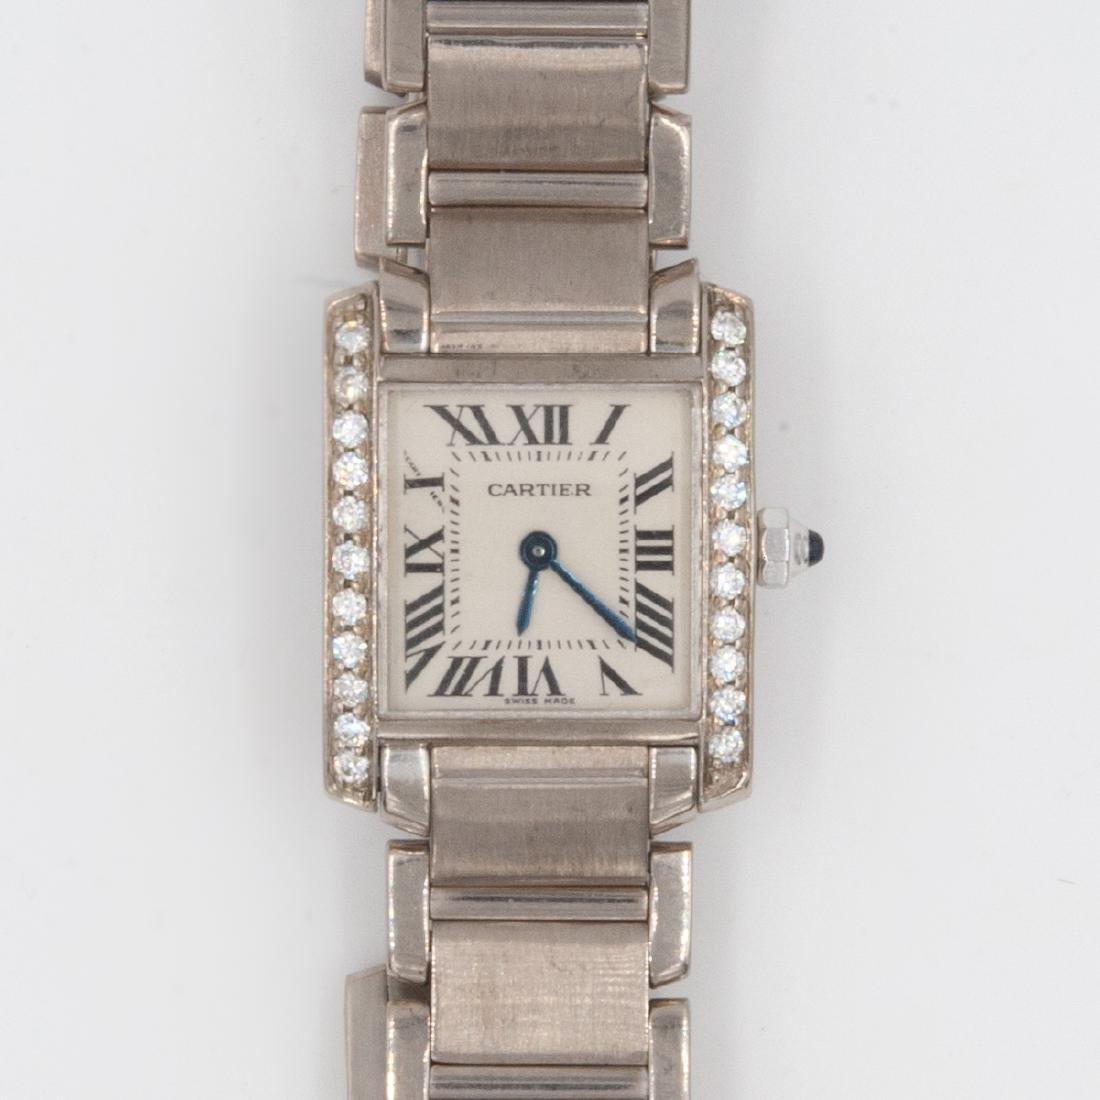 18k Gold Cartier Ladies Watch